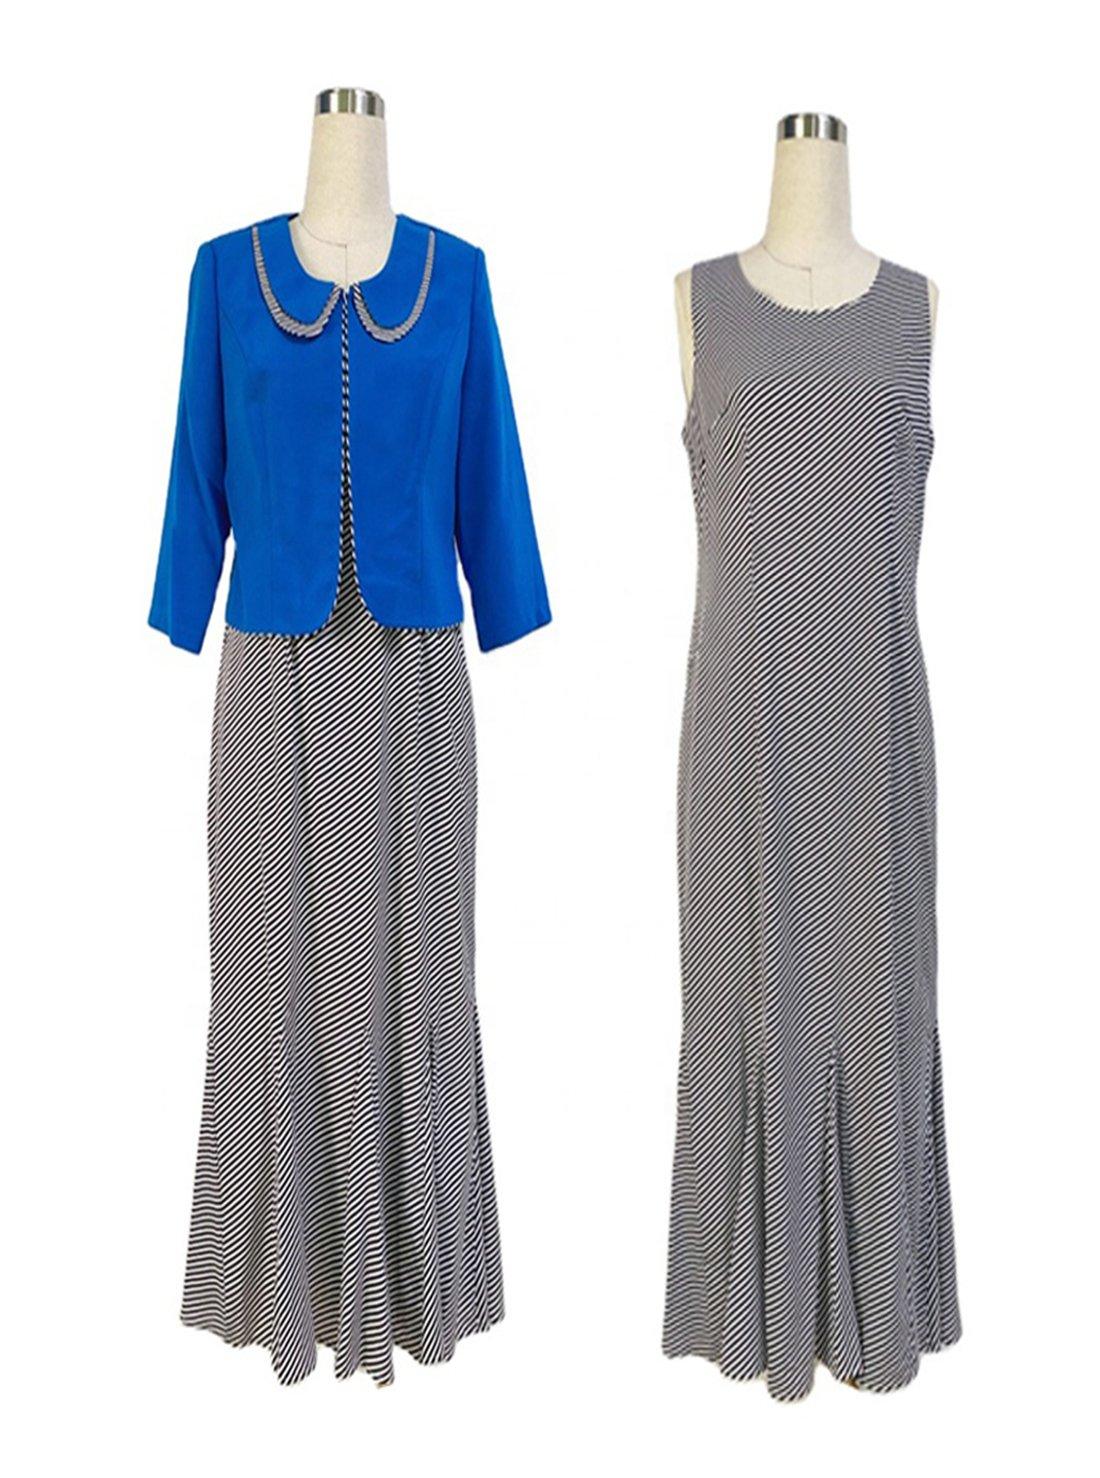 Ladies Coat Dress Suits for Africa